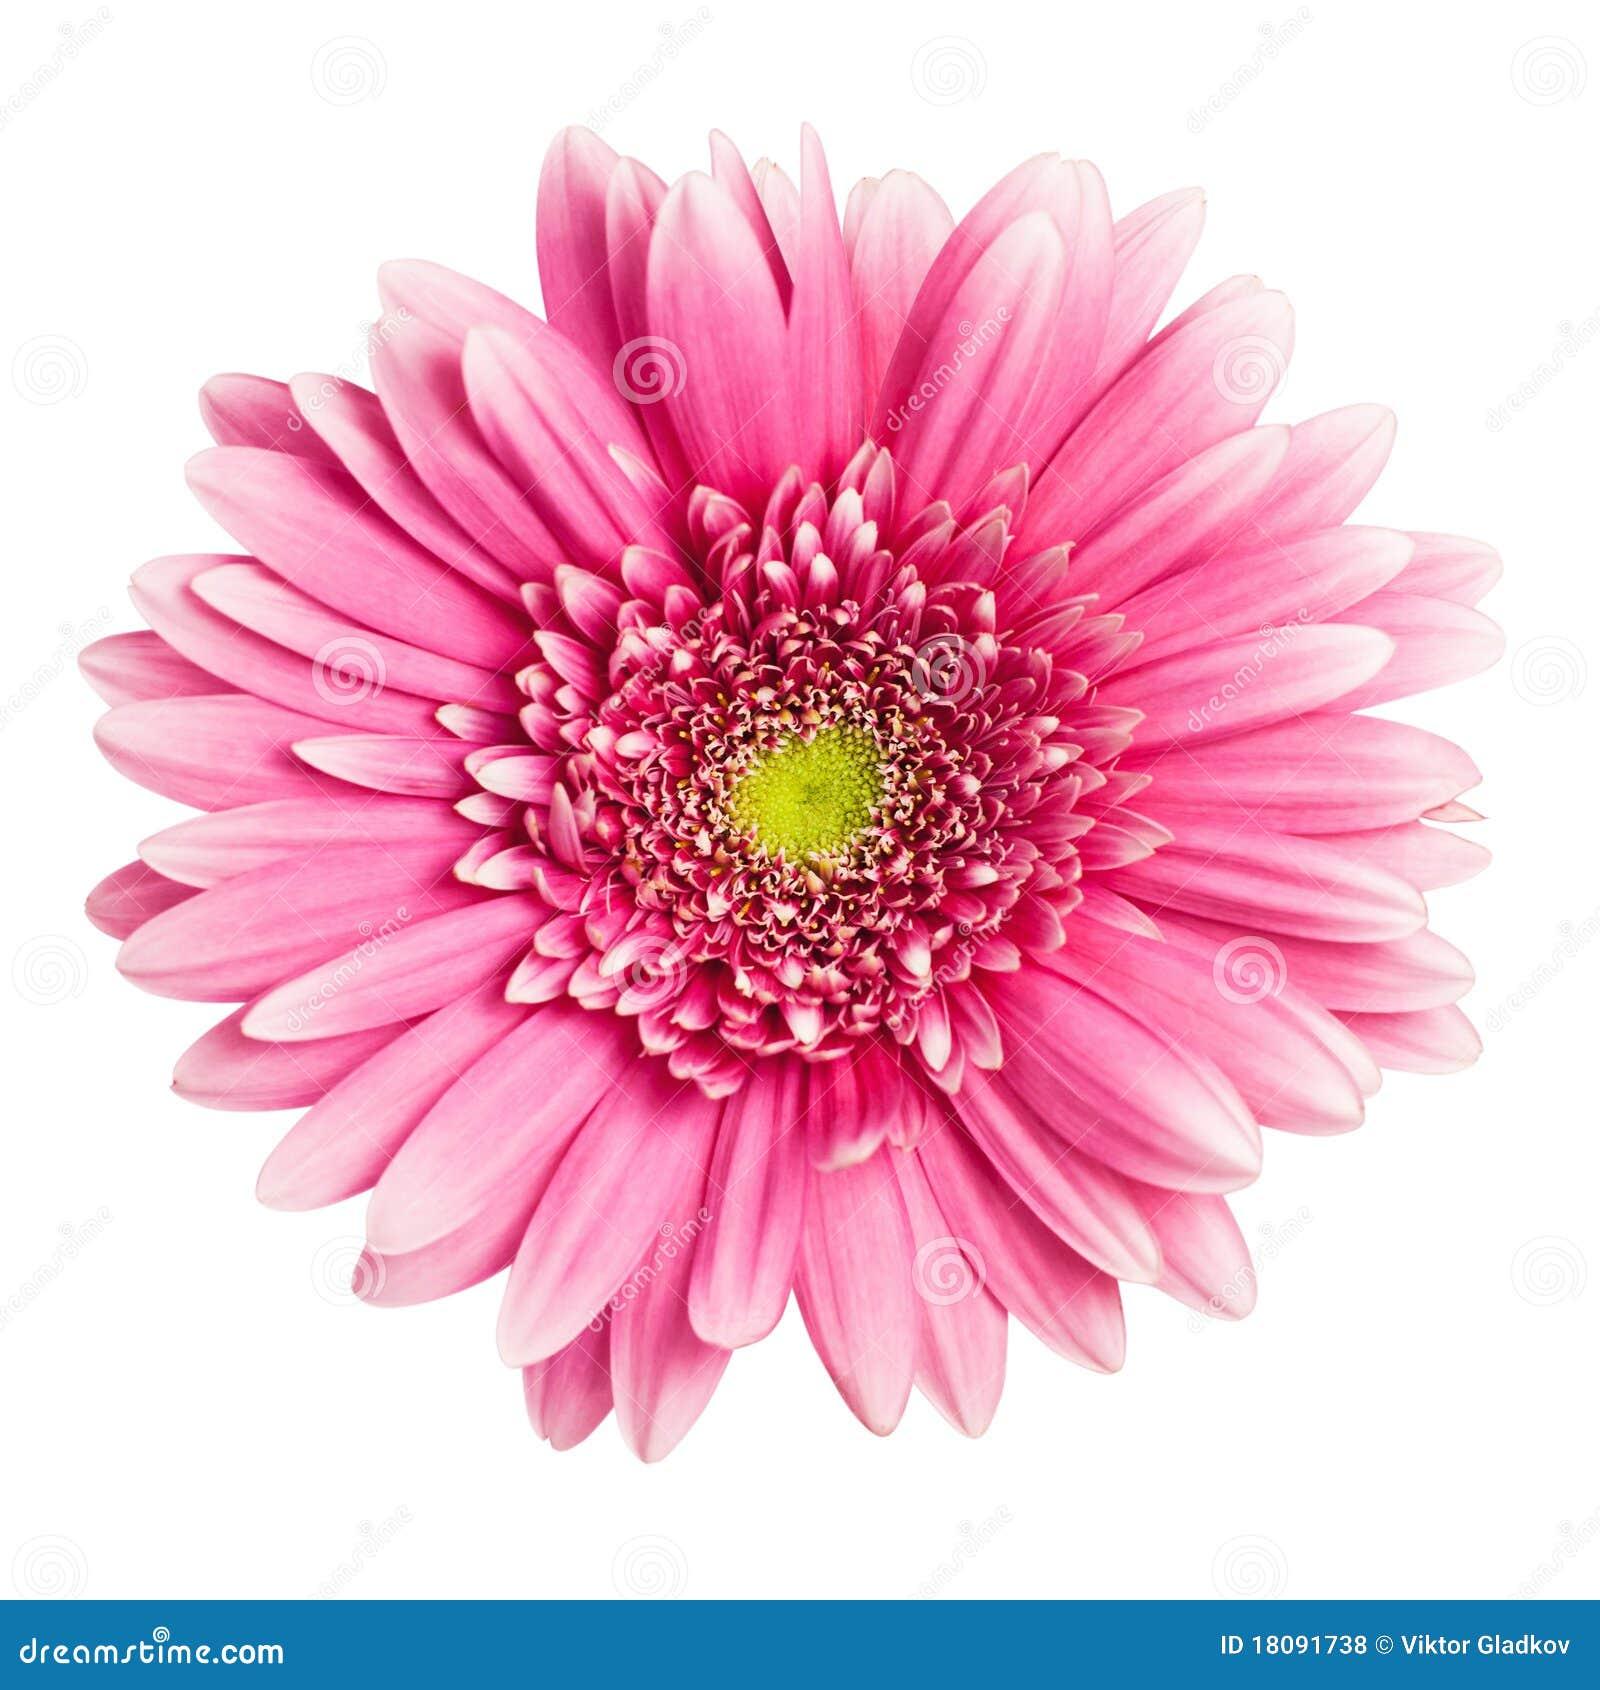 Pink Gerbera Flower Stock Photo Image Of Daisy Decoration 18091738